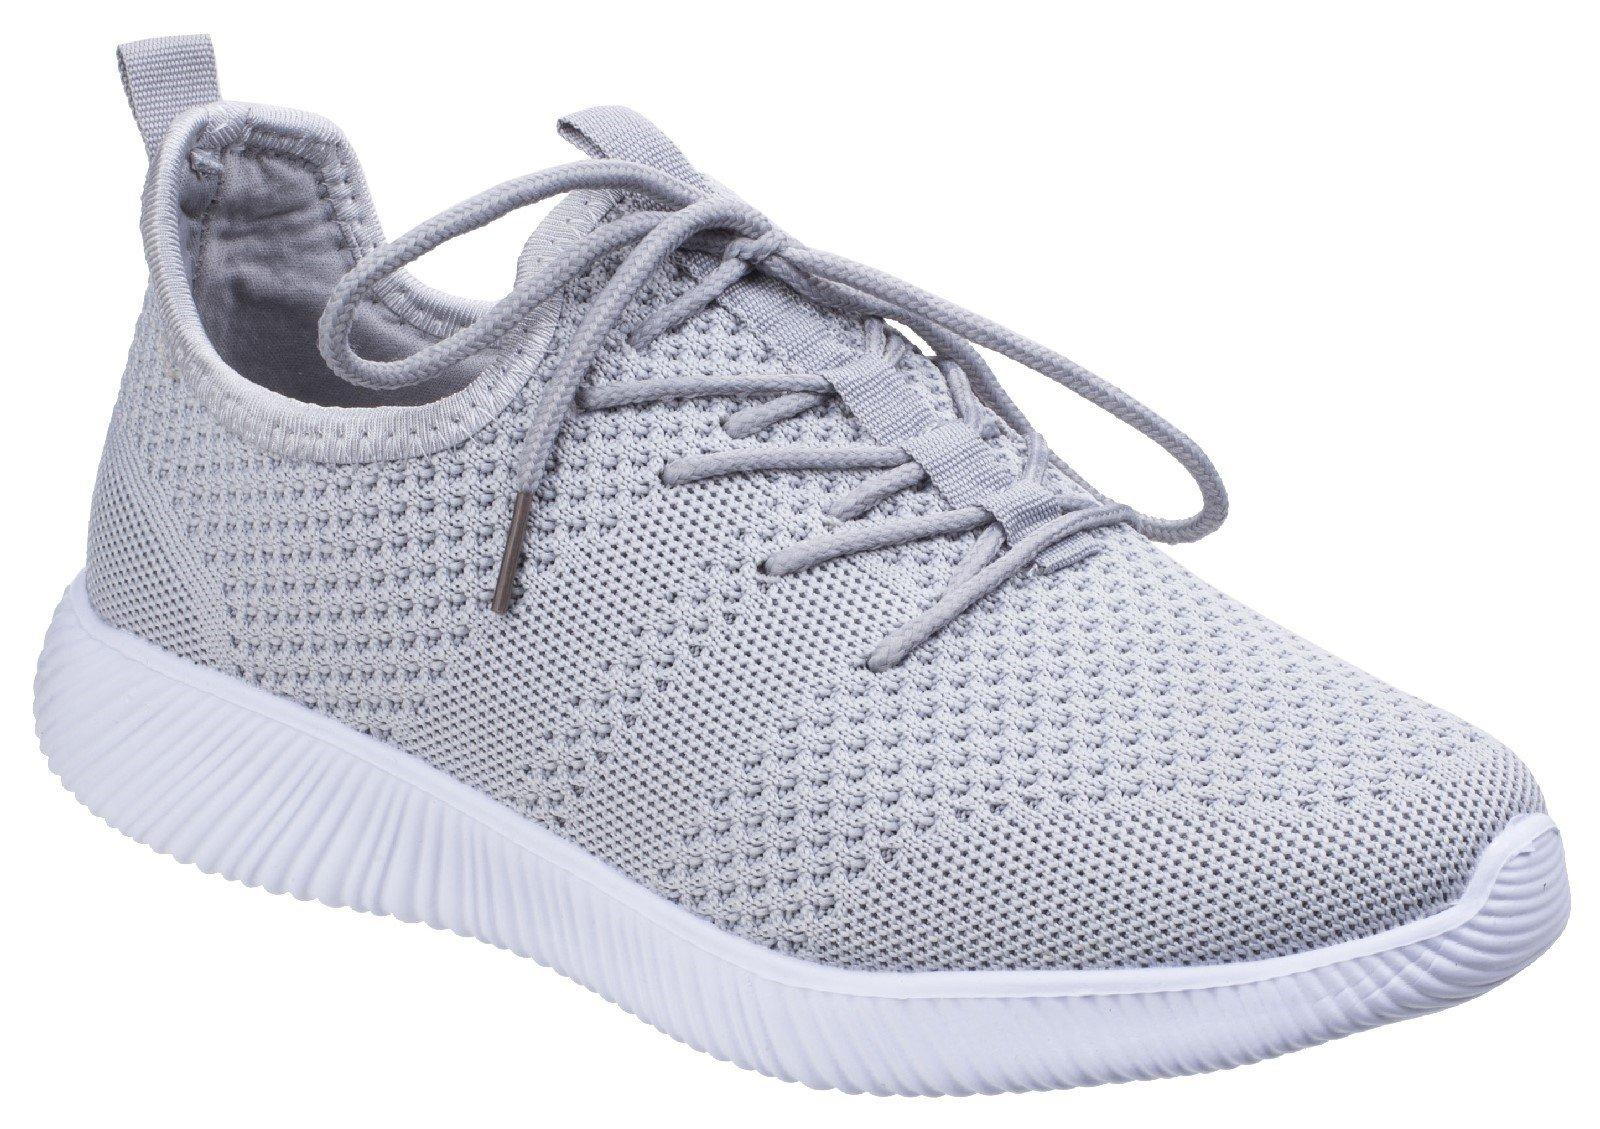 Divaz Women's Heidi Knit Trainer Grey 26327-43957 - Grey 3